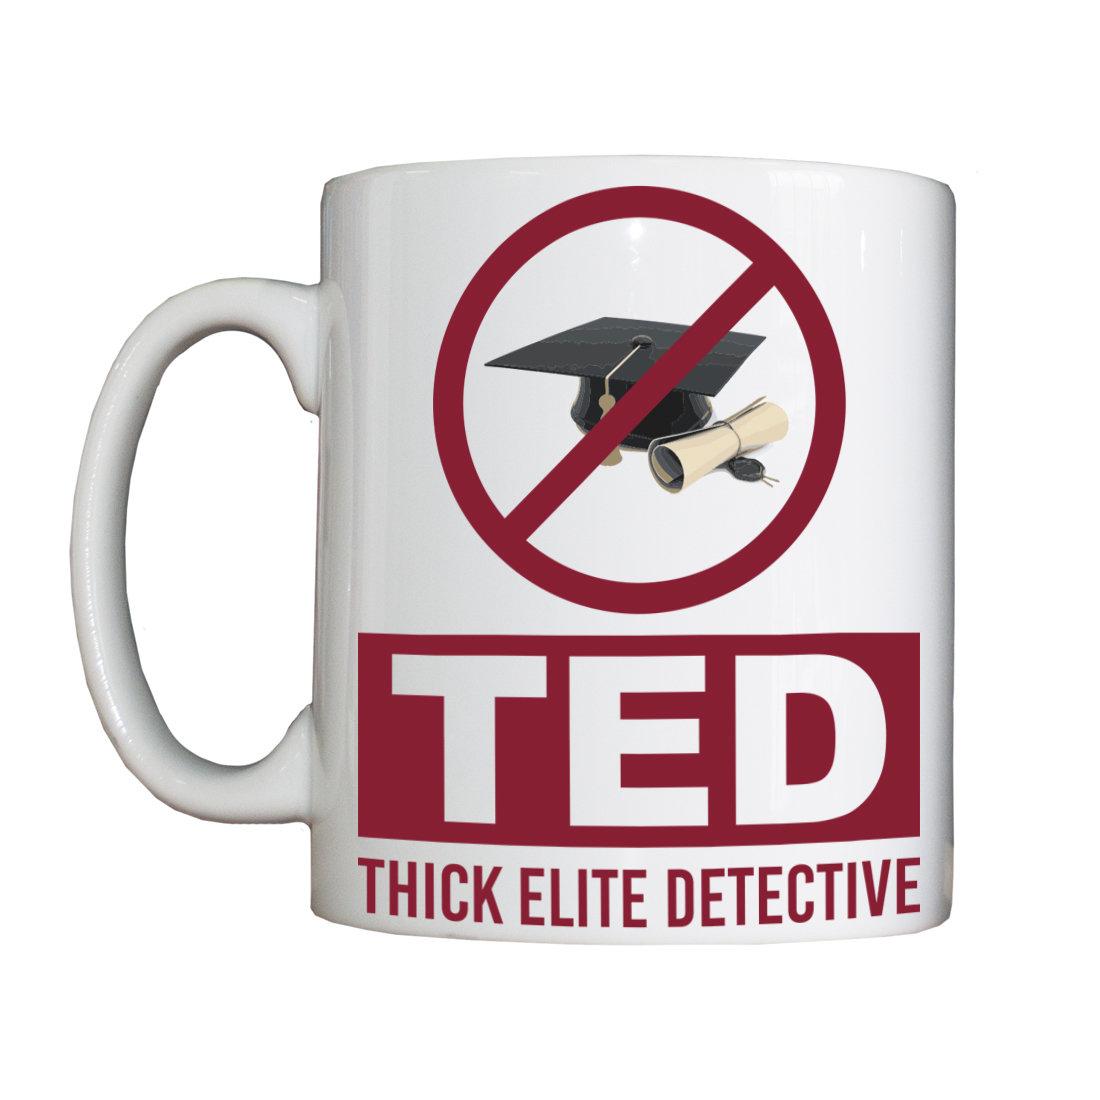 Personalised 'Thick Elite Detective' Vessel ThickEliteDetectiveVessel